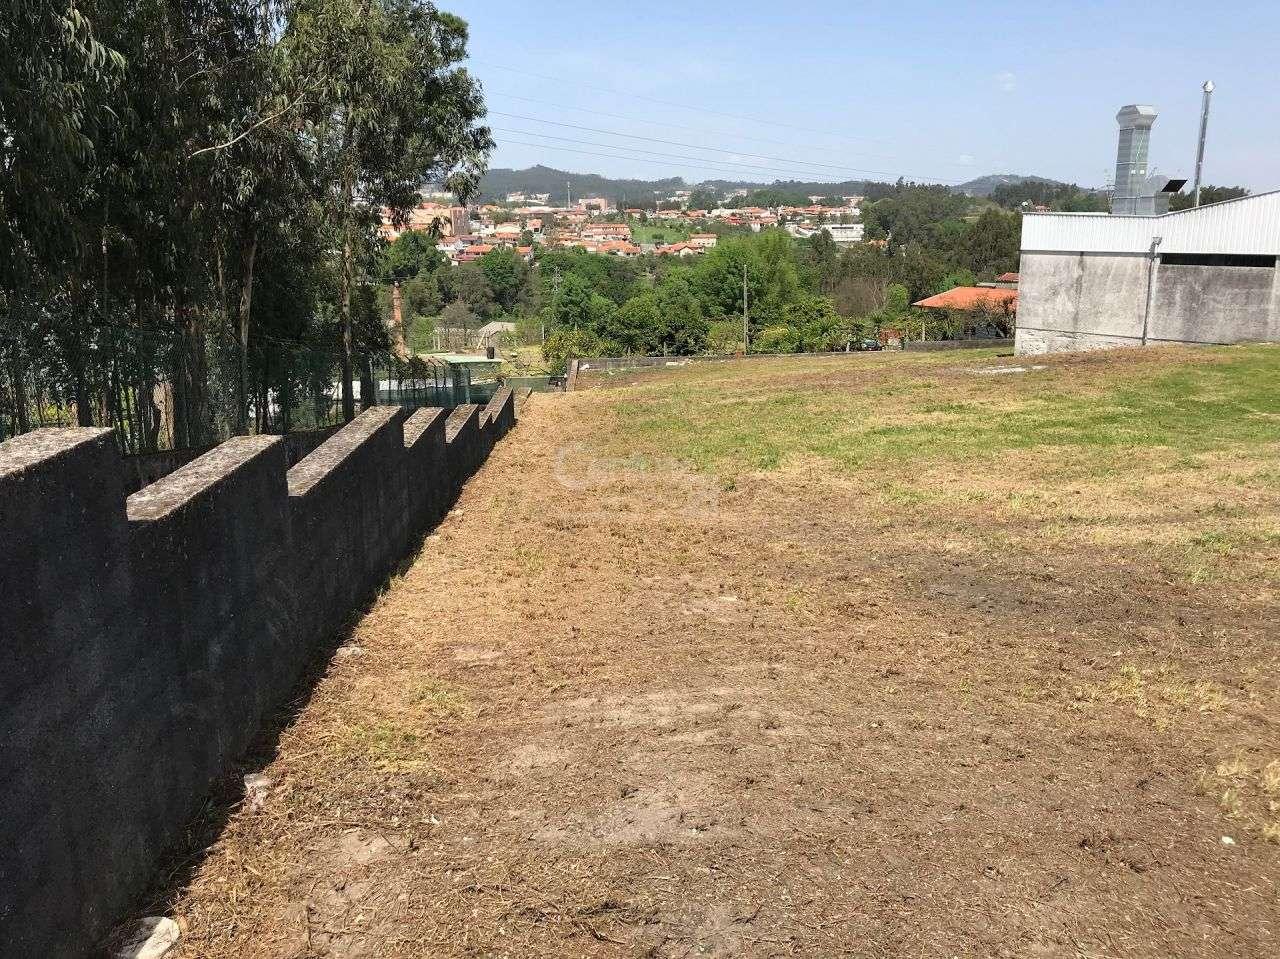 Terreno para comprar, Castêlo da Maia, Porto - Foto 3